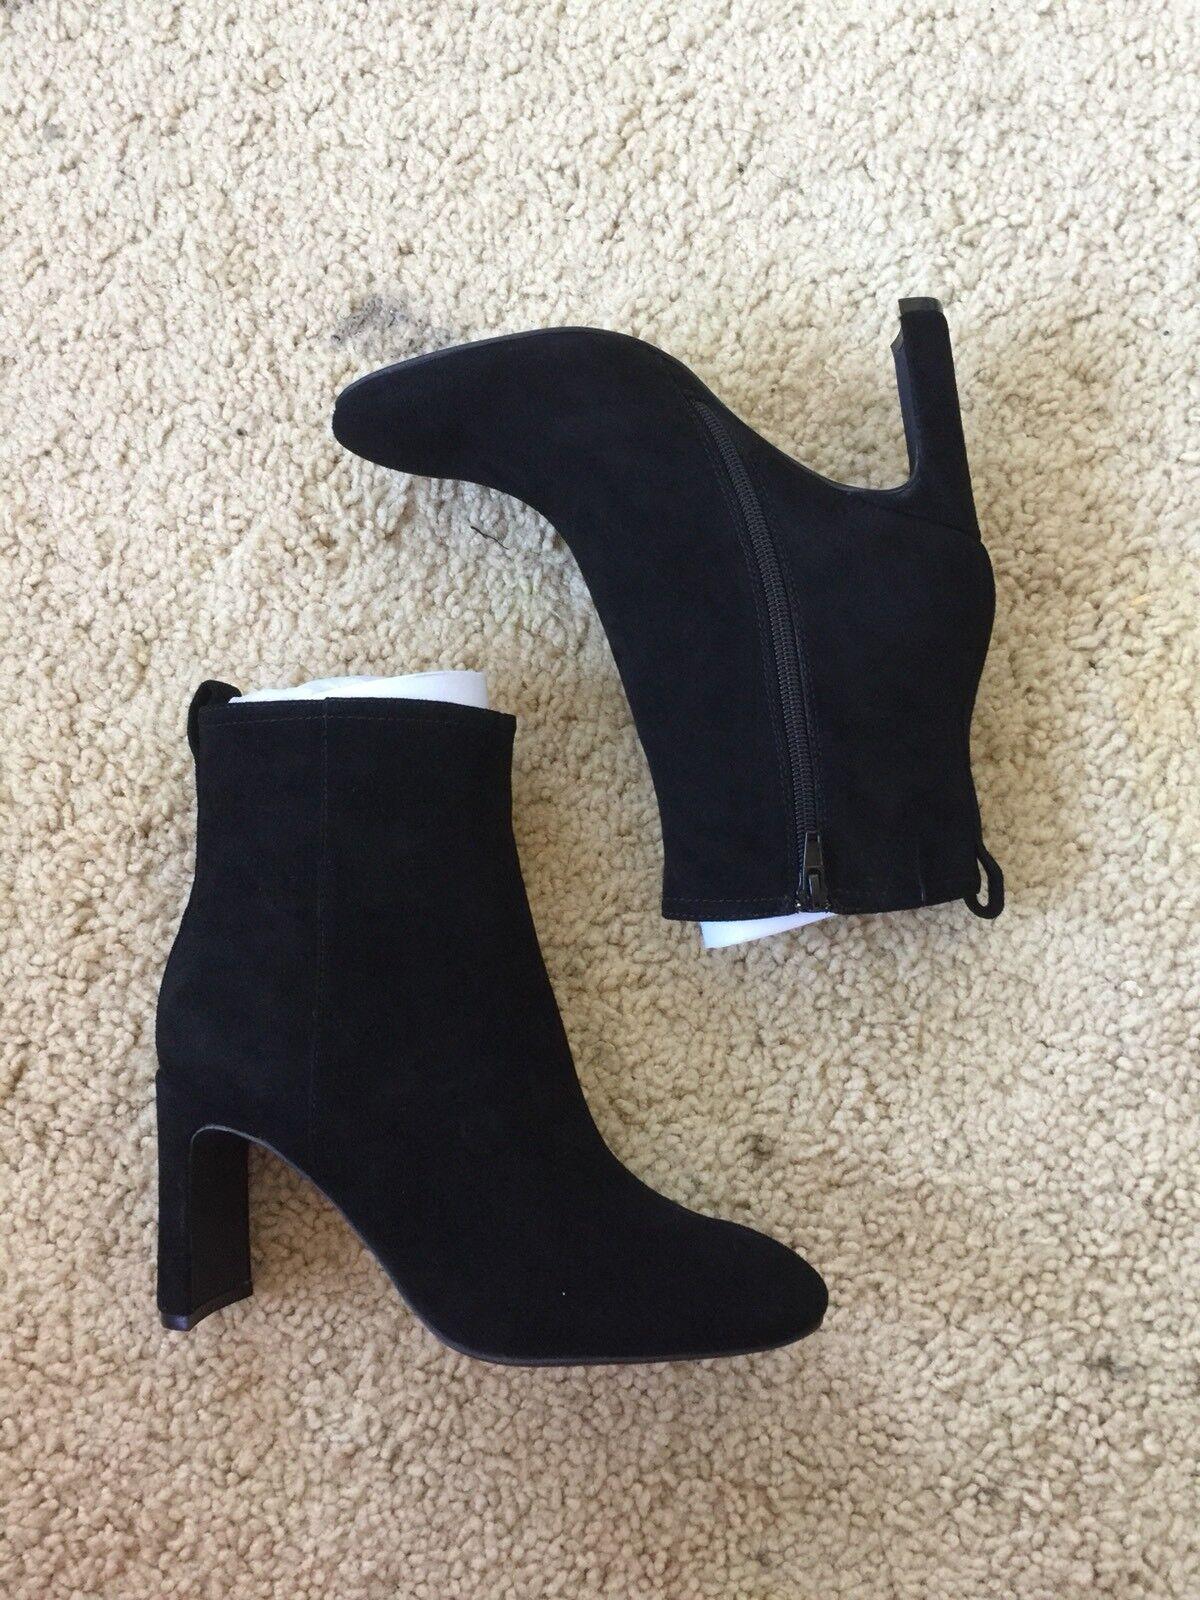 Jeffrey Campbell femmes noir velvet suede Chapel Curved Heel démarrageie sz 9.5 170